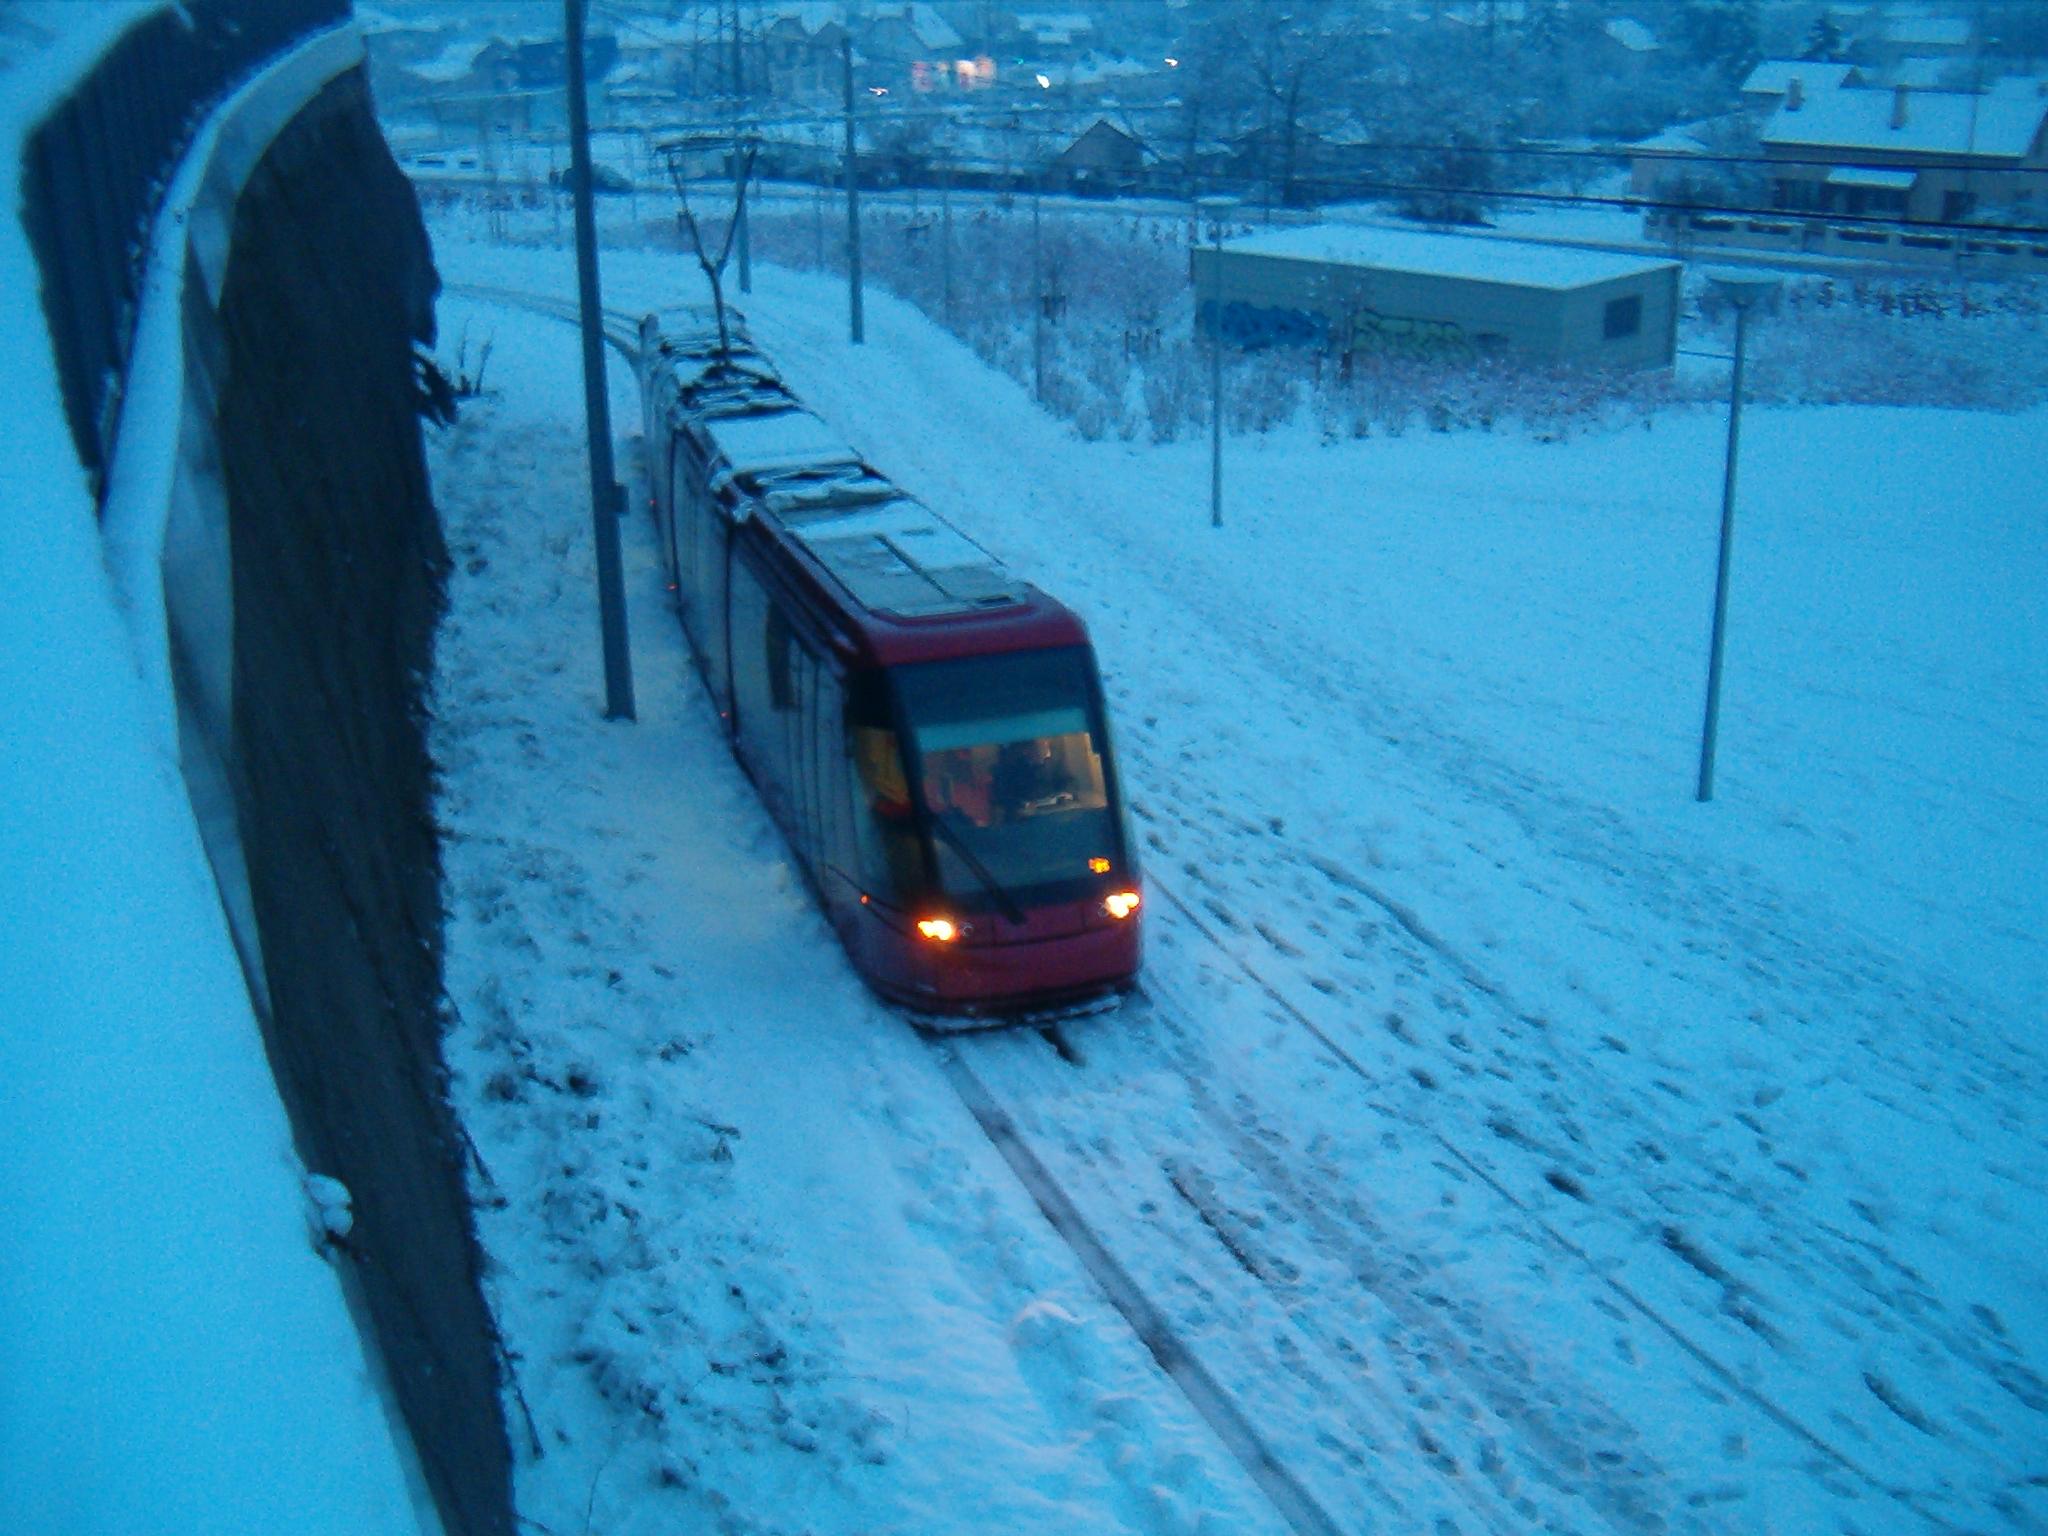 translohr bloque dans les neiges.jpg